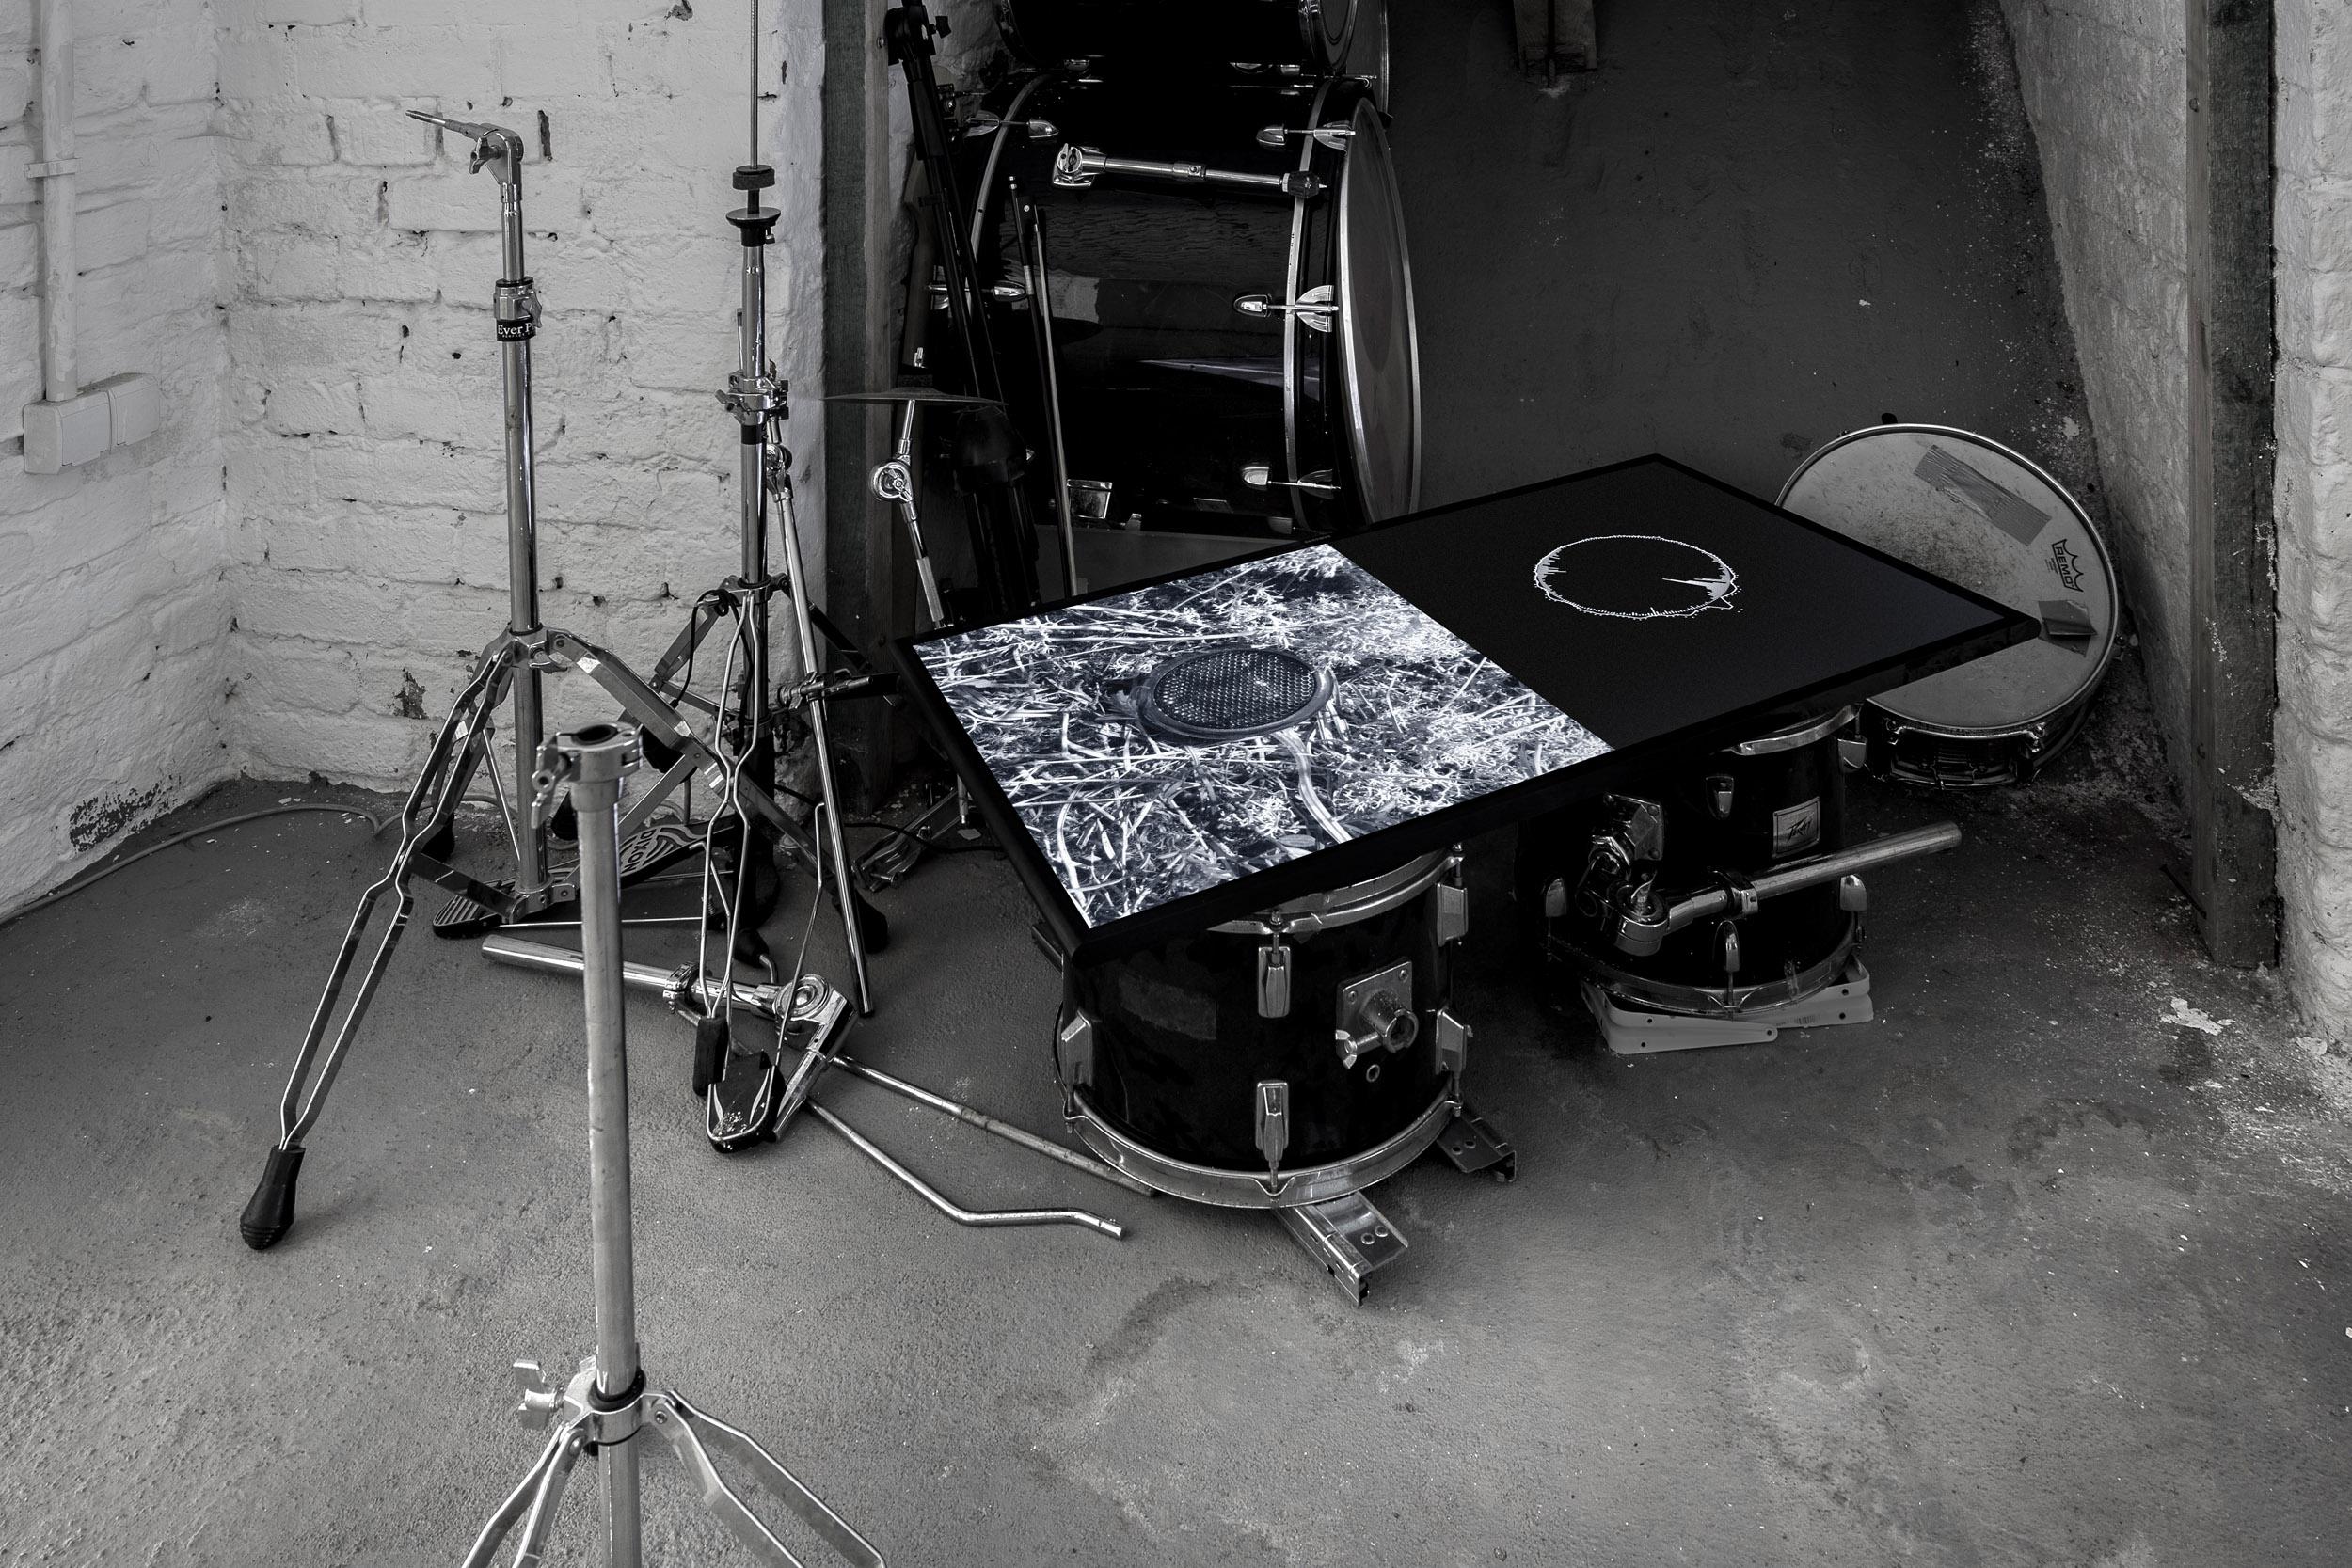 Jacek Doroszenko - Natural potential, video installation, Warsaw Gallery Weekend, Propaganda